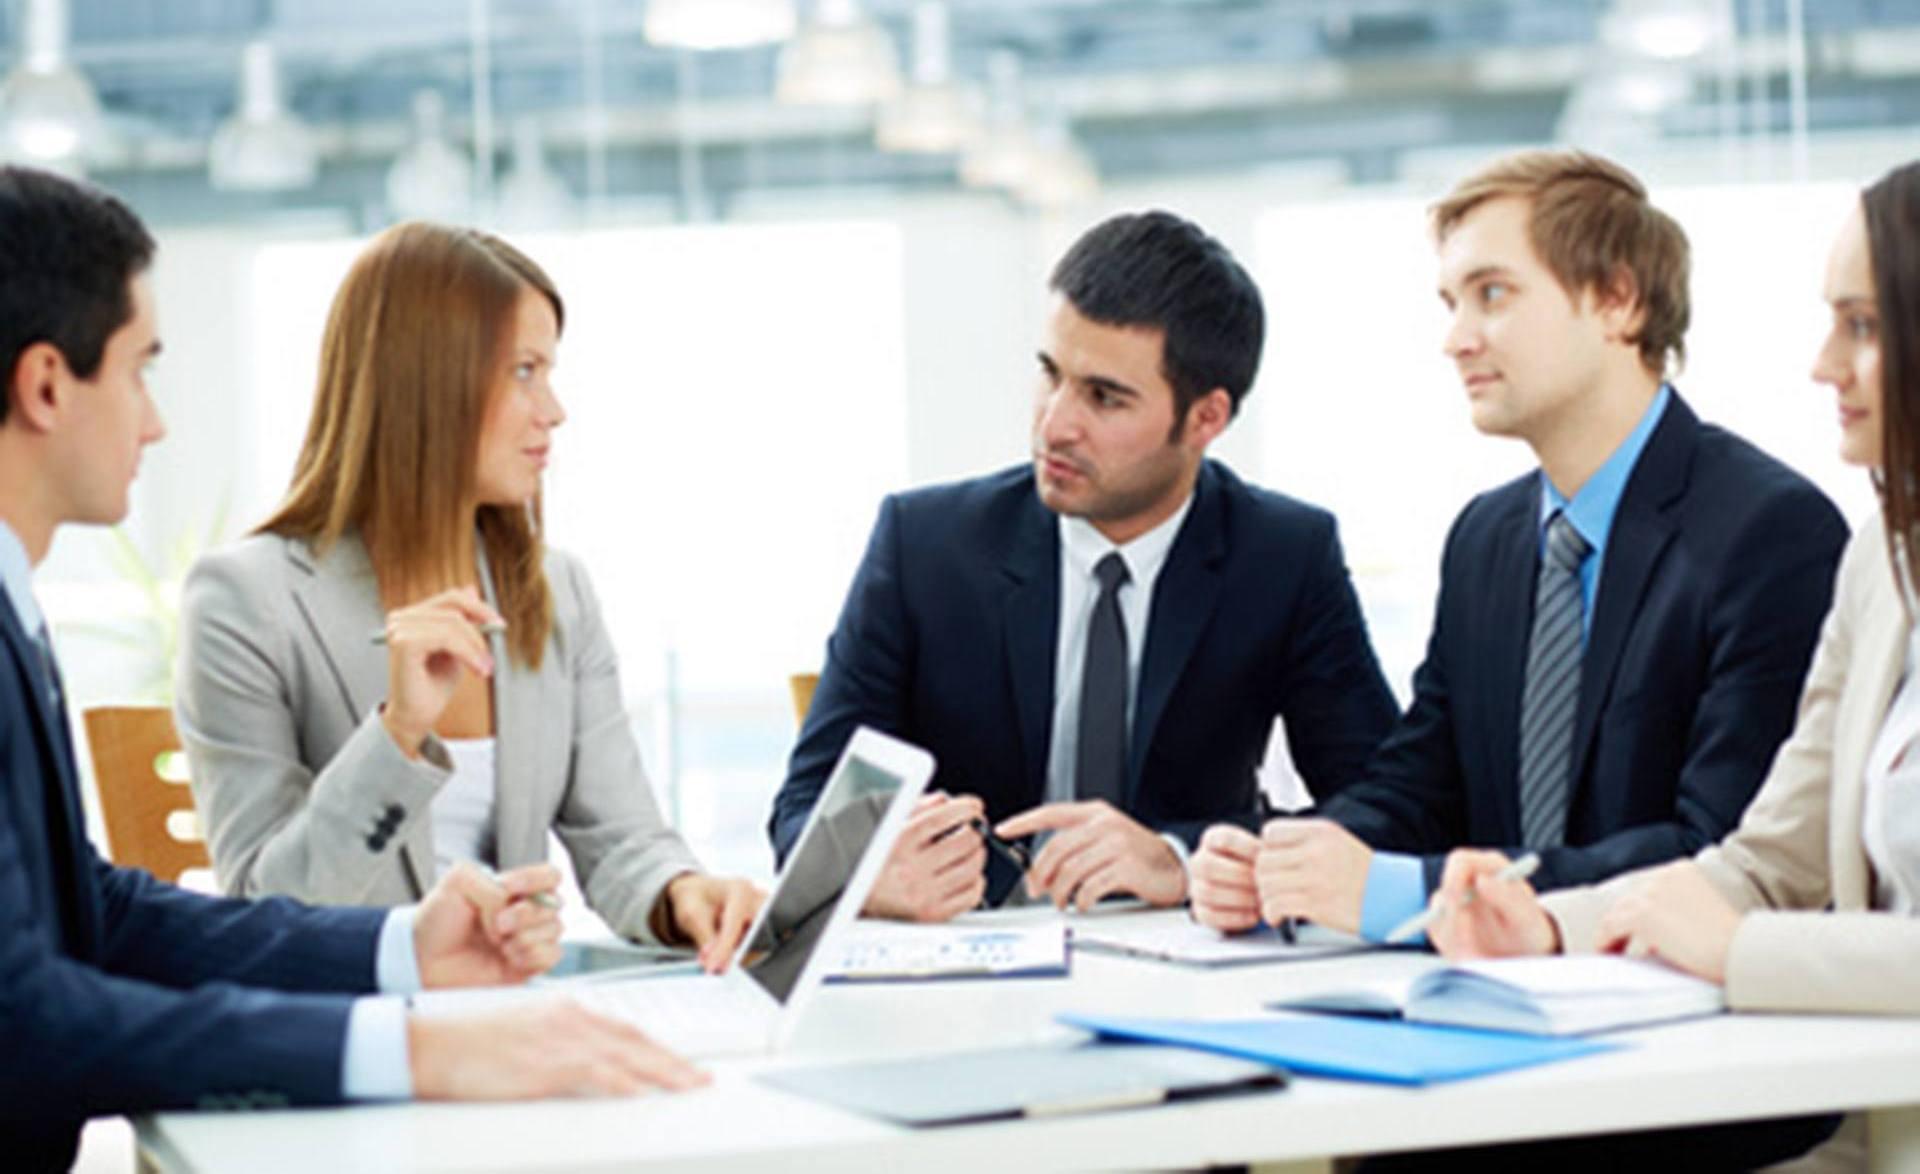 Testy kompetencyjne w rekrutacji? CV rekrutacja medarun com